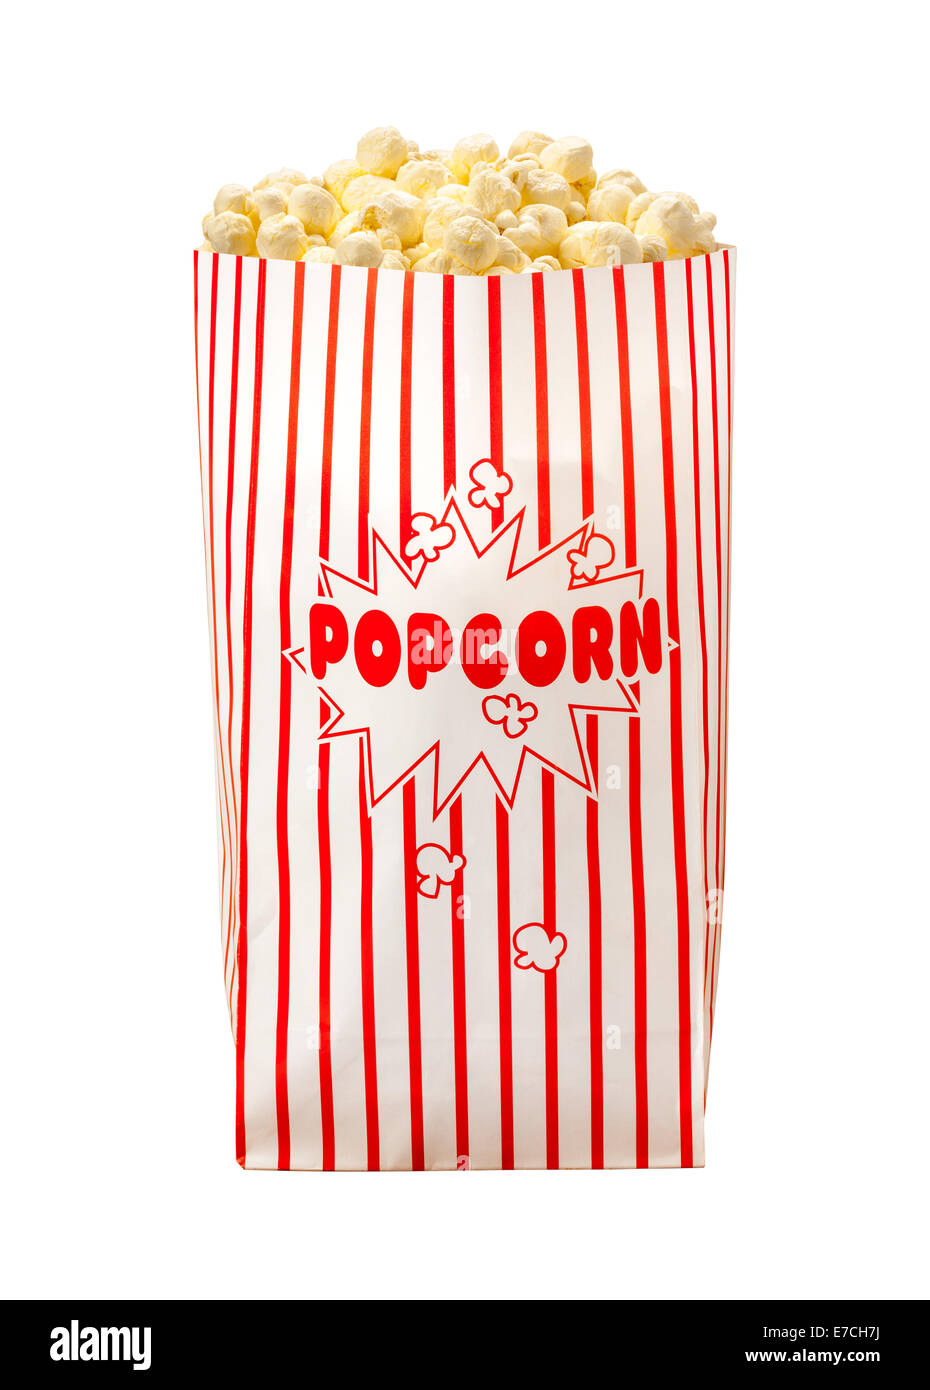 Popcorn Bag isolated on a white background. - Stock Image